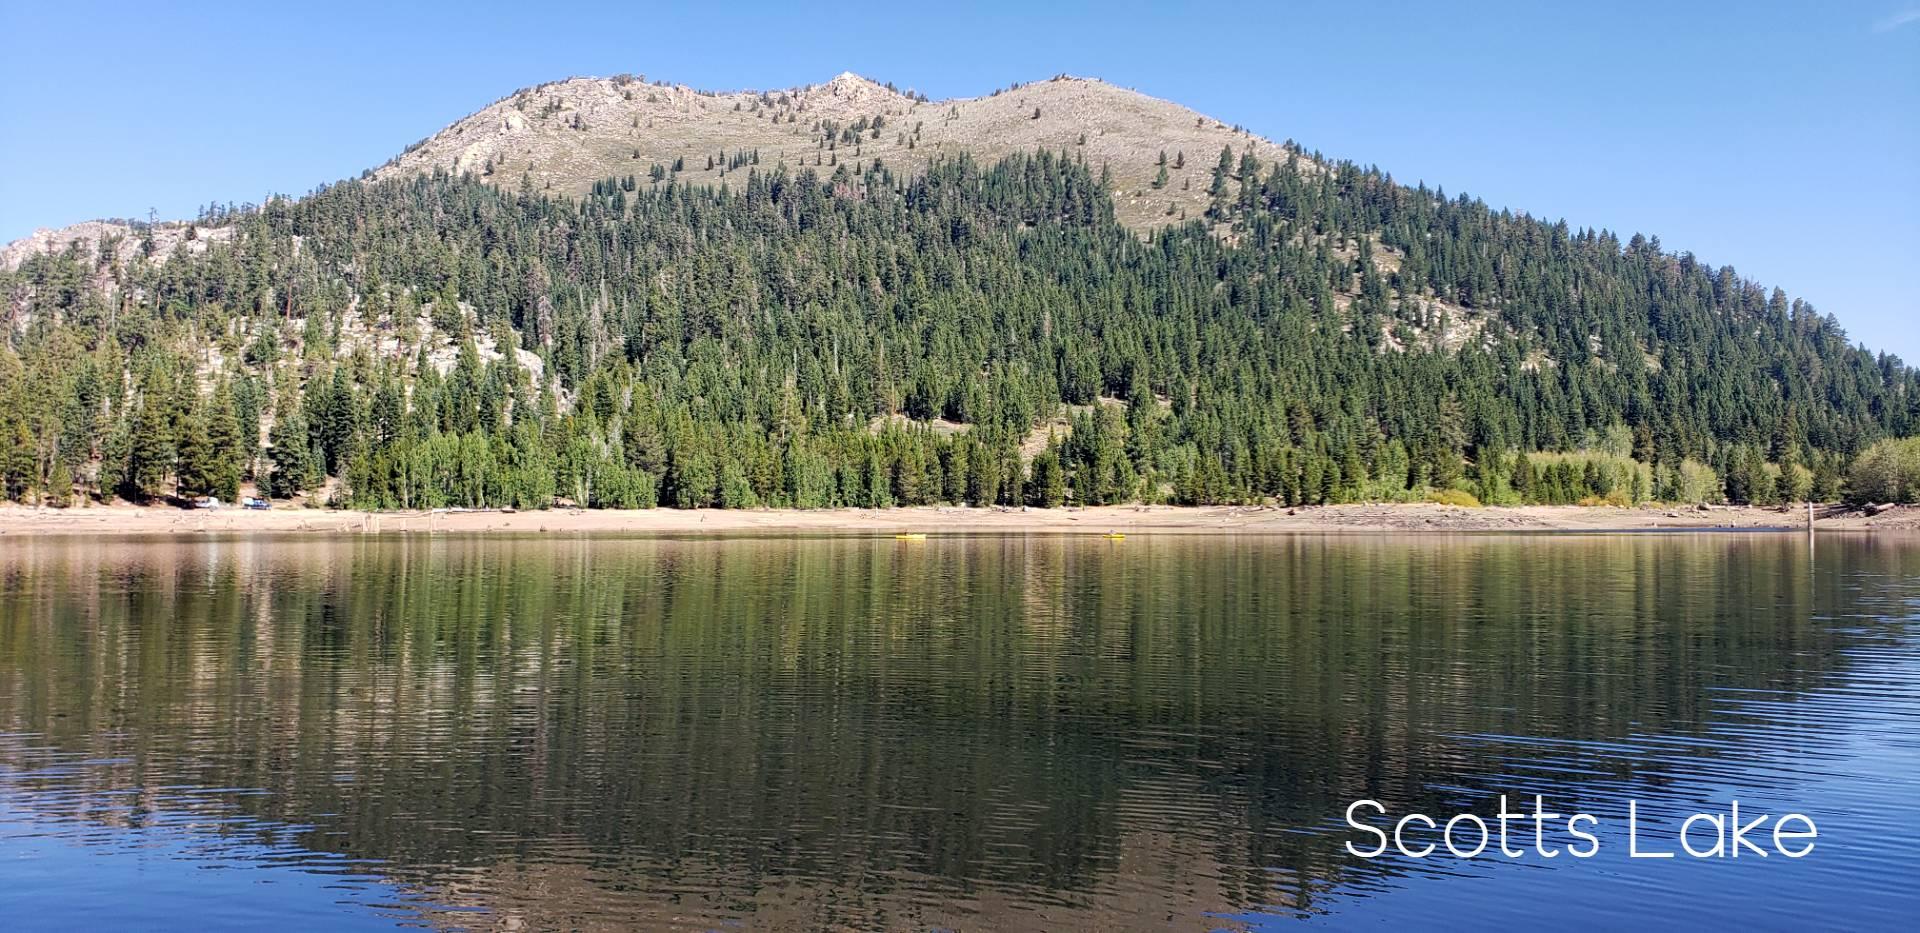 Scotts-Lake-Humbolt-Toiabye2020